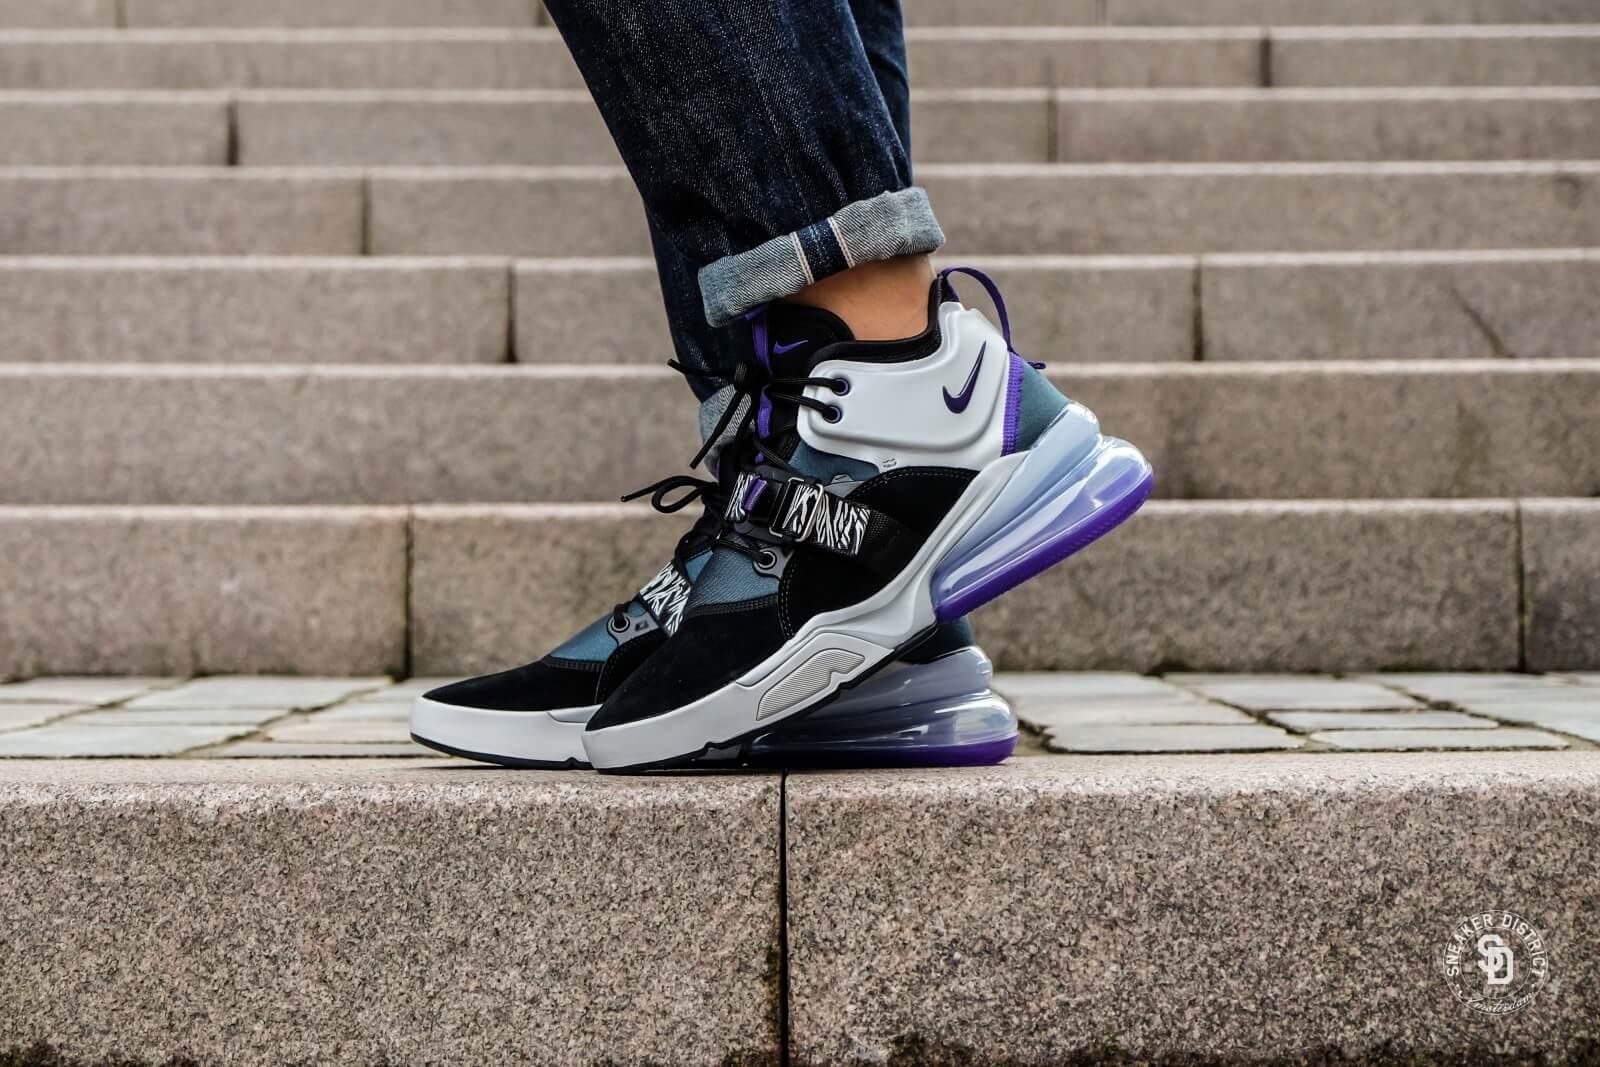 744b3139a34e Nike air force black court purple atomic teal jpg 1600x1067 Purple nike 270